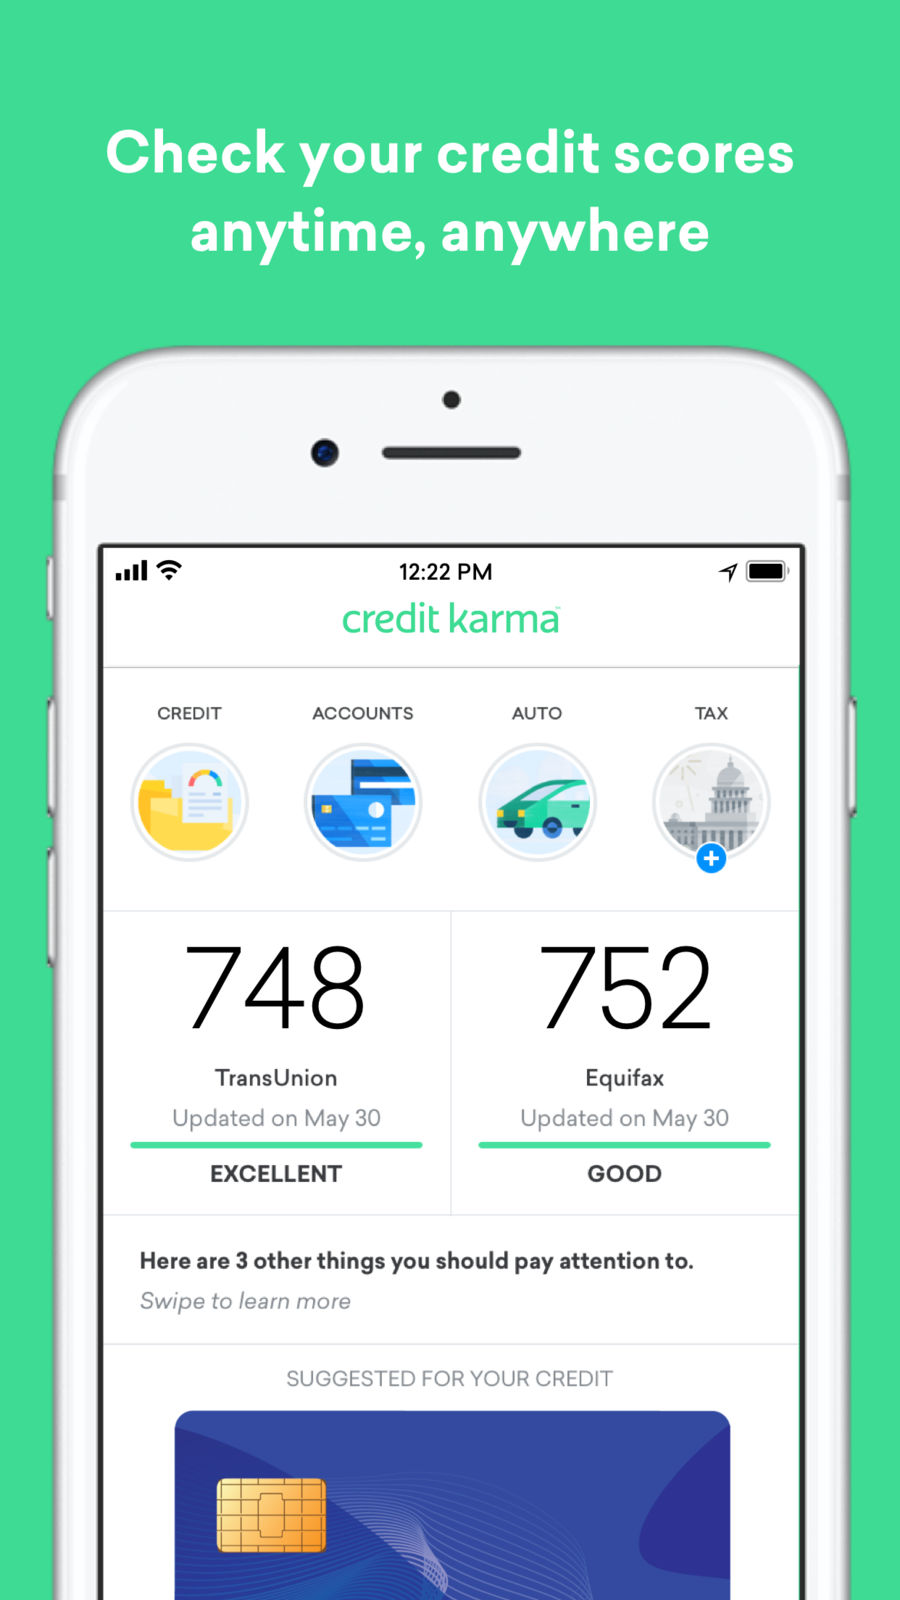 mobile support credit karma.com